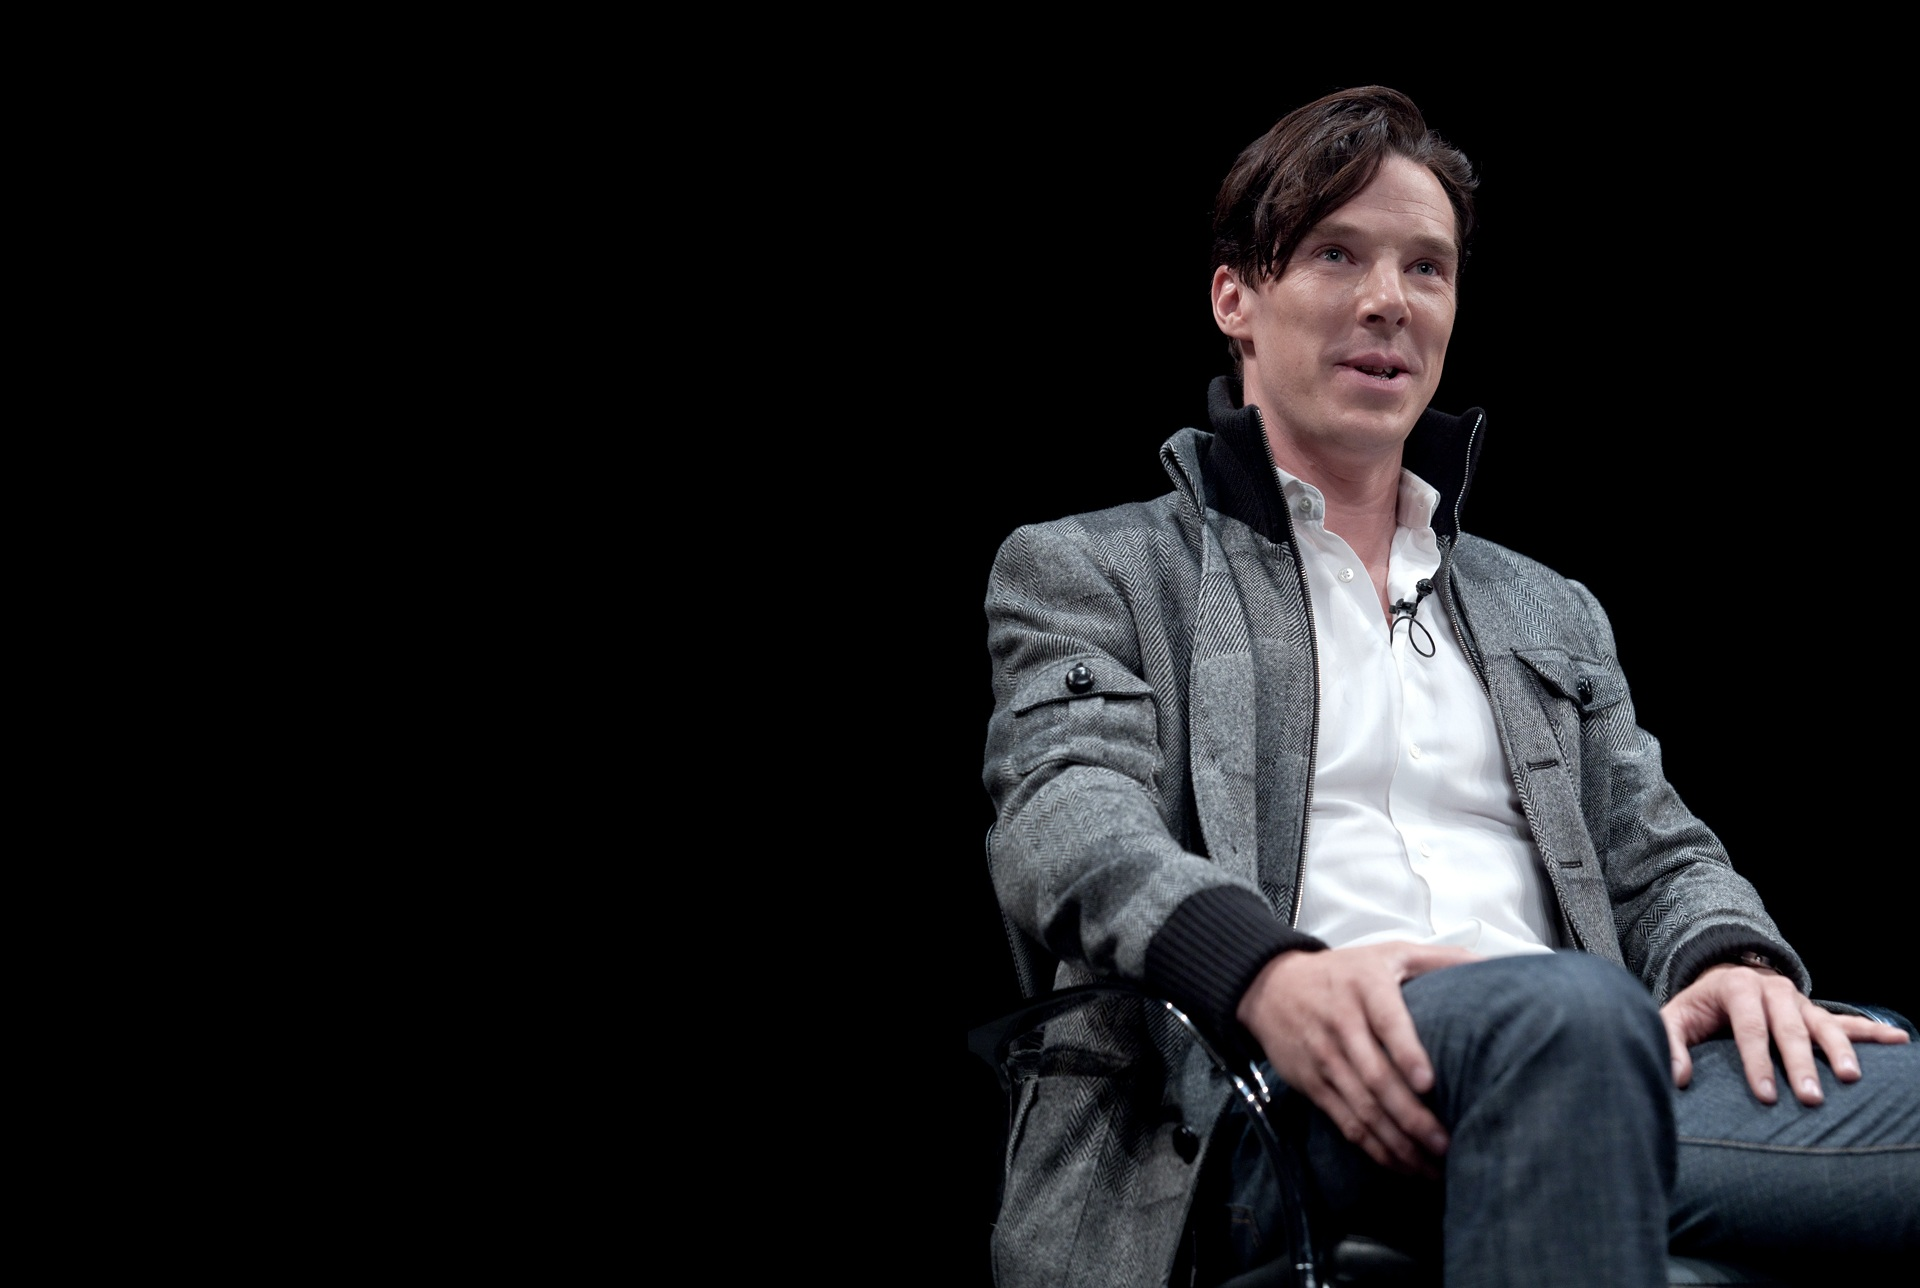 Benedict Cumberbatch Image - ID: 330793 - Image Abyss